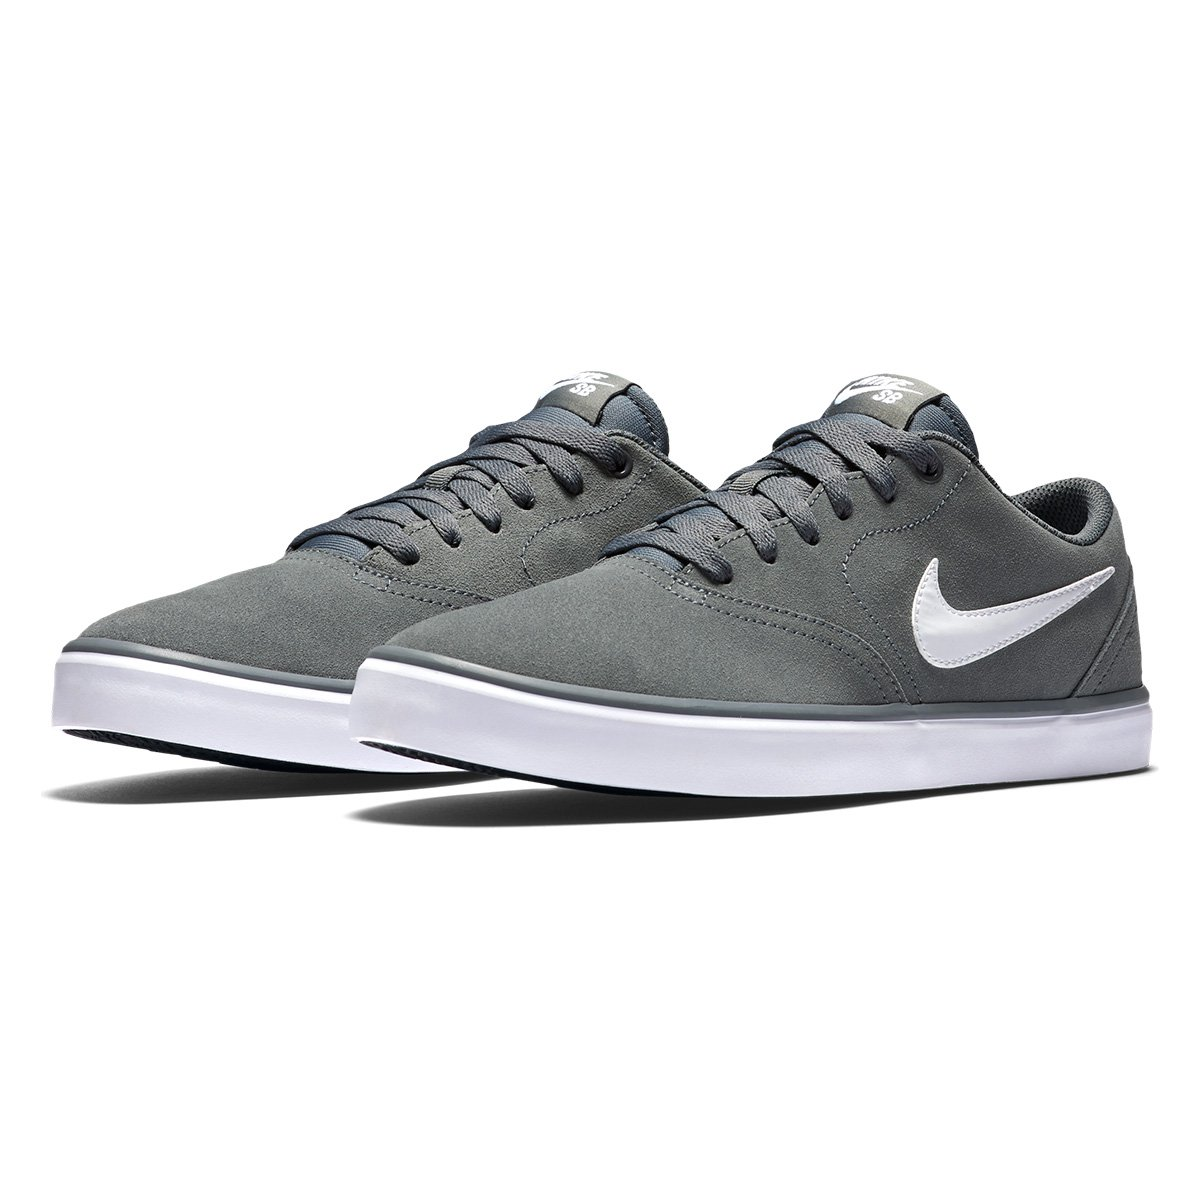 5d108a261c8d67  Tênis Nike Sb Check Solar Masculino - Cinza - Compre Agora  Loja do . f716d409f7ee1